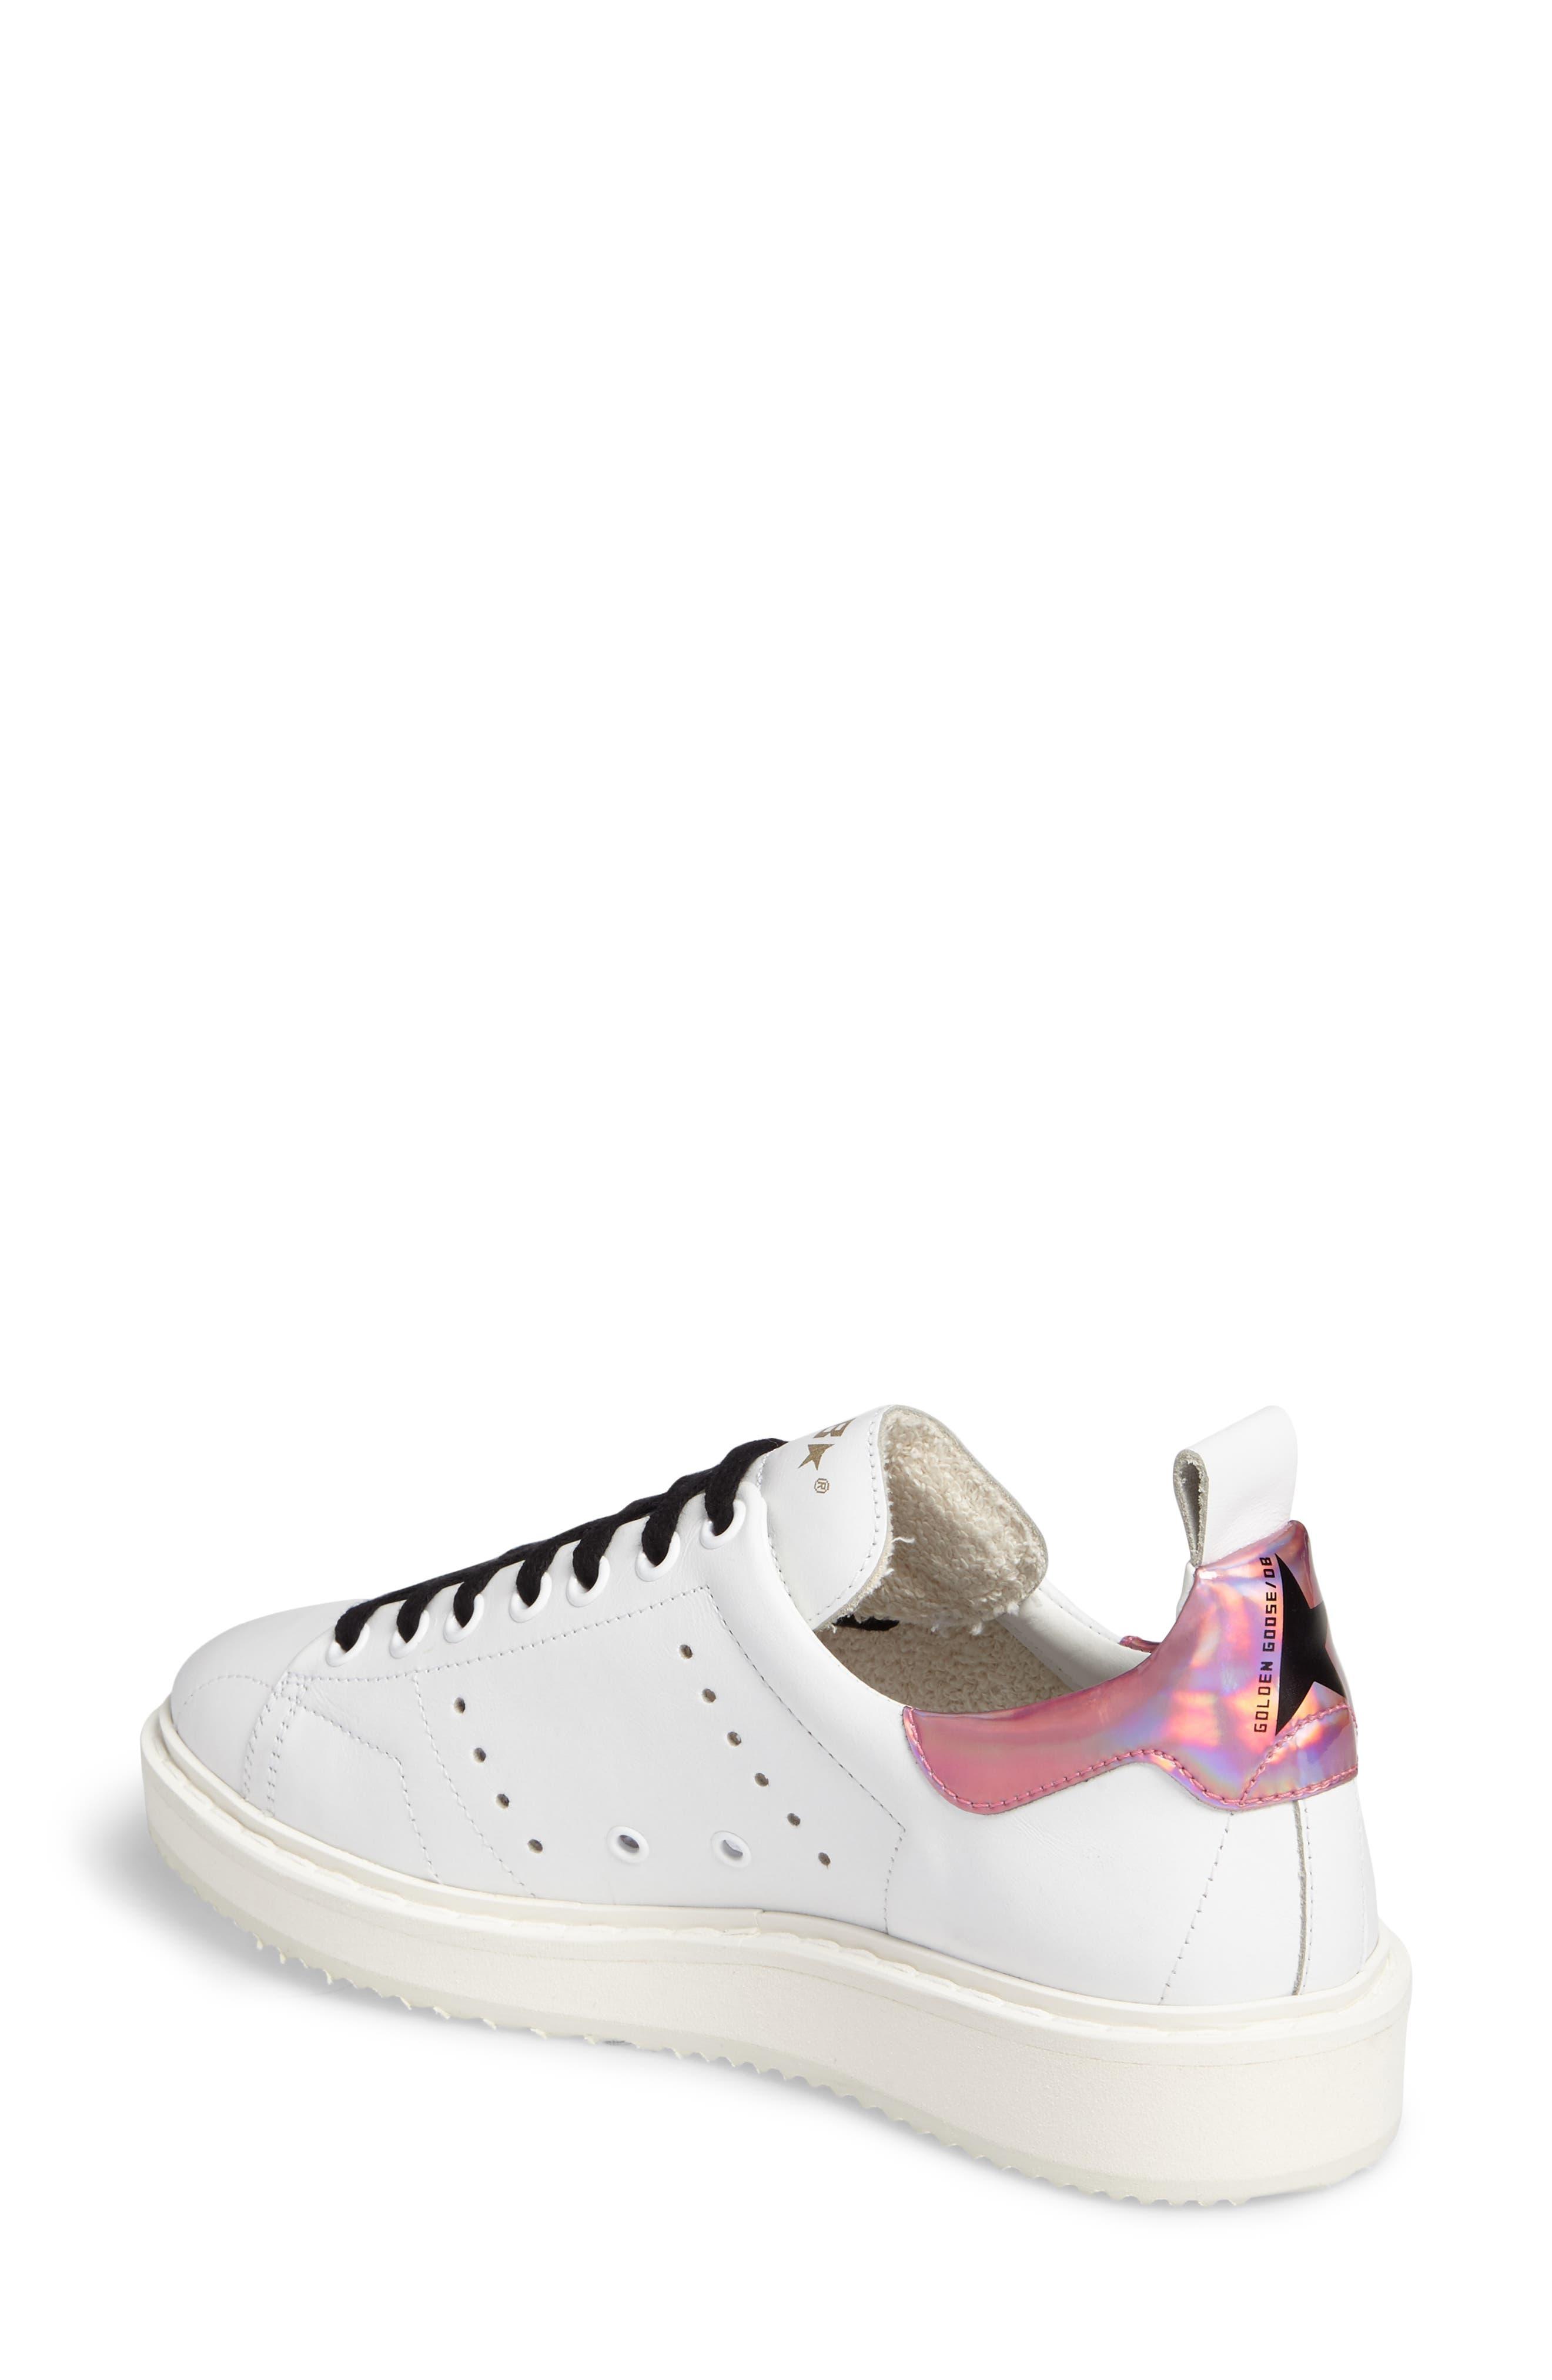 Starter Low Top Sneaker,                             Alternate thumbnail 2, color,                             100